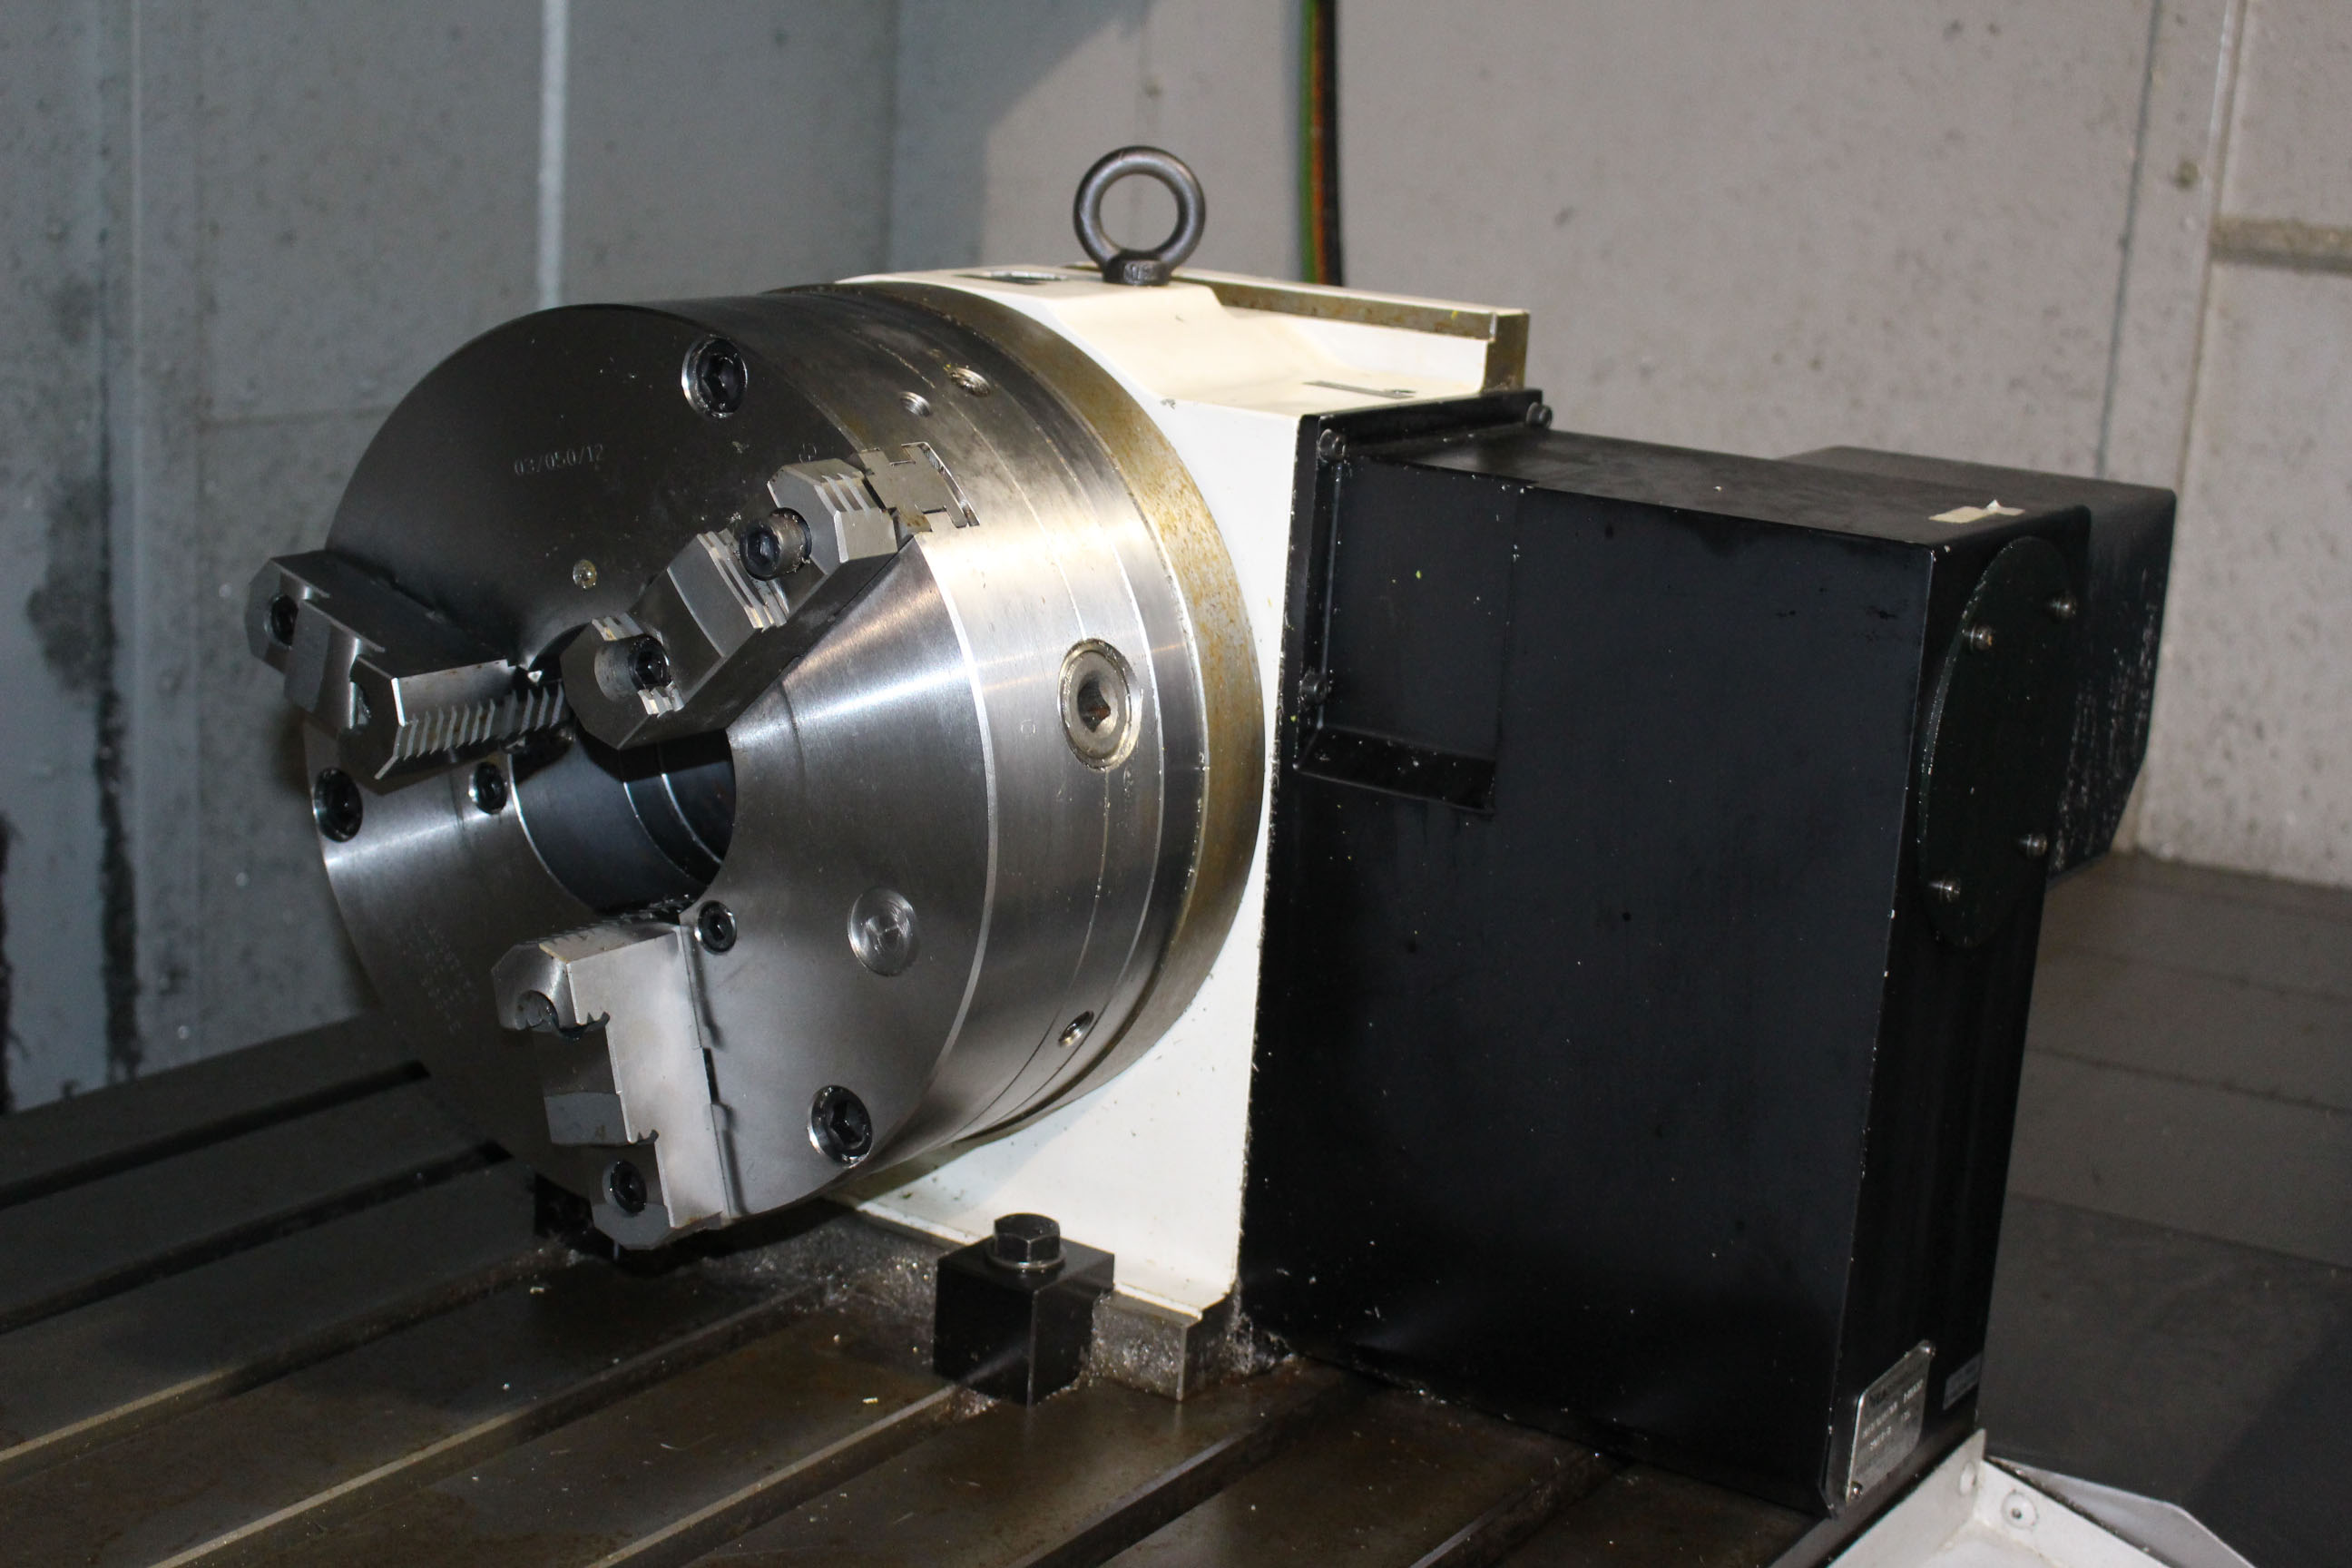 Lot 25 - VERTICAL MACHINING CENTER, MORI SEIKI MDL. NVX7000/50 4-AXIS, new 6/2014, DMG Mori FOIMD CNC control